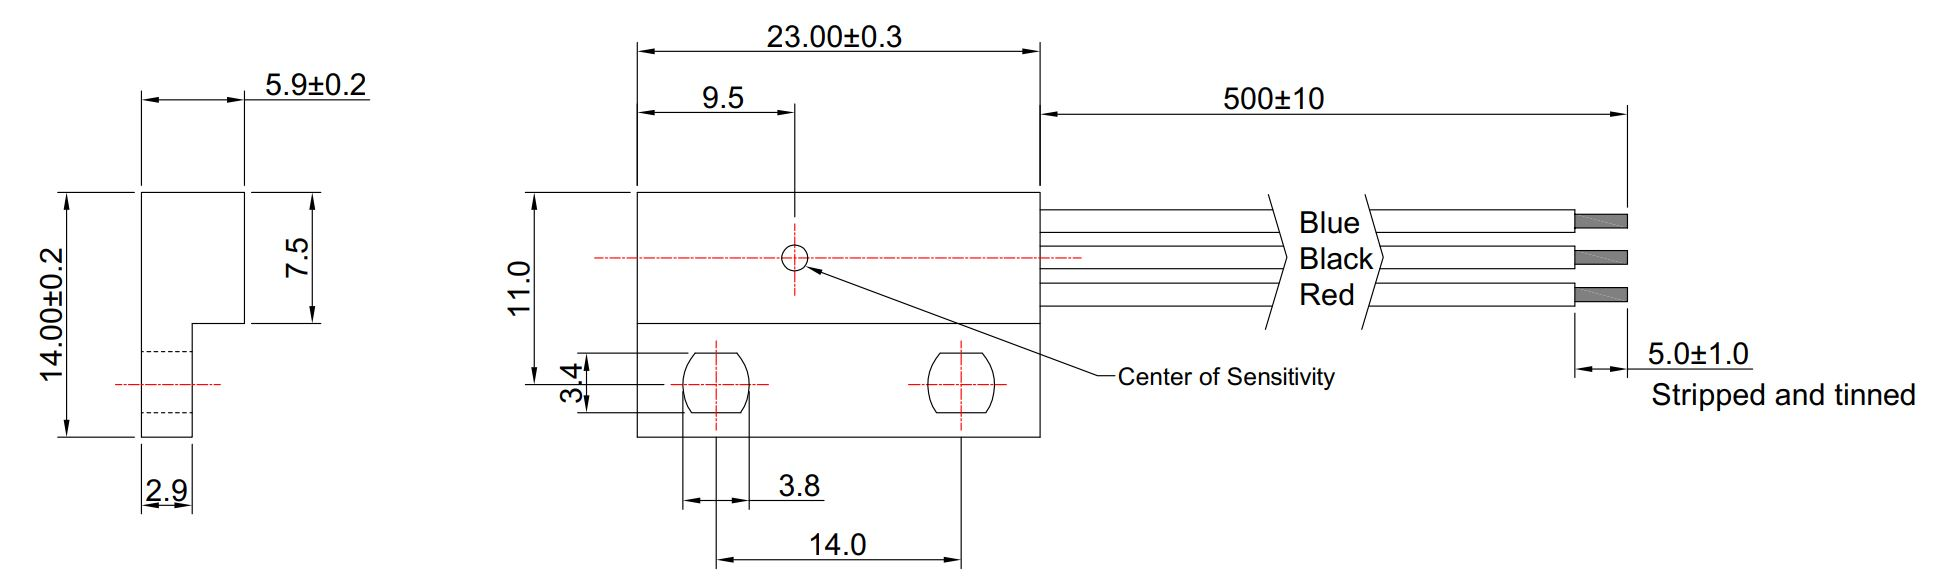 Hallsensor Unipolar Switch MHS-102 (3-Draht)